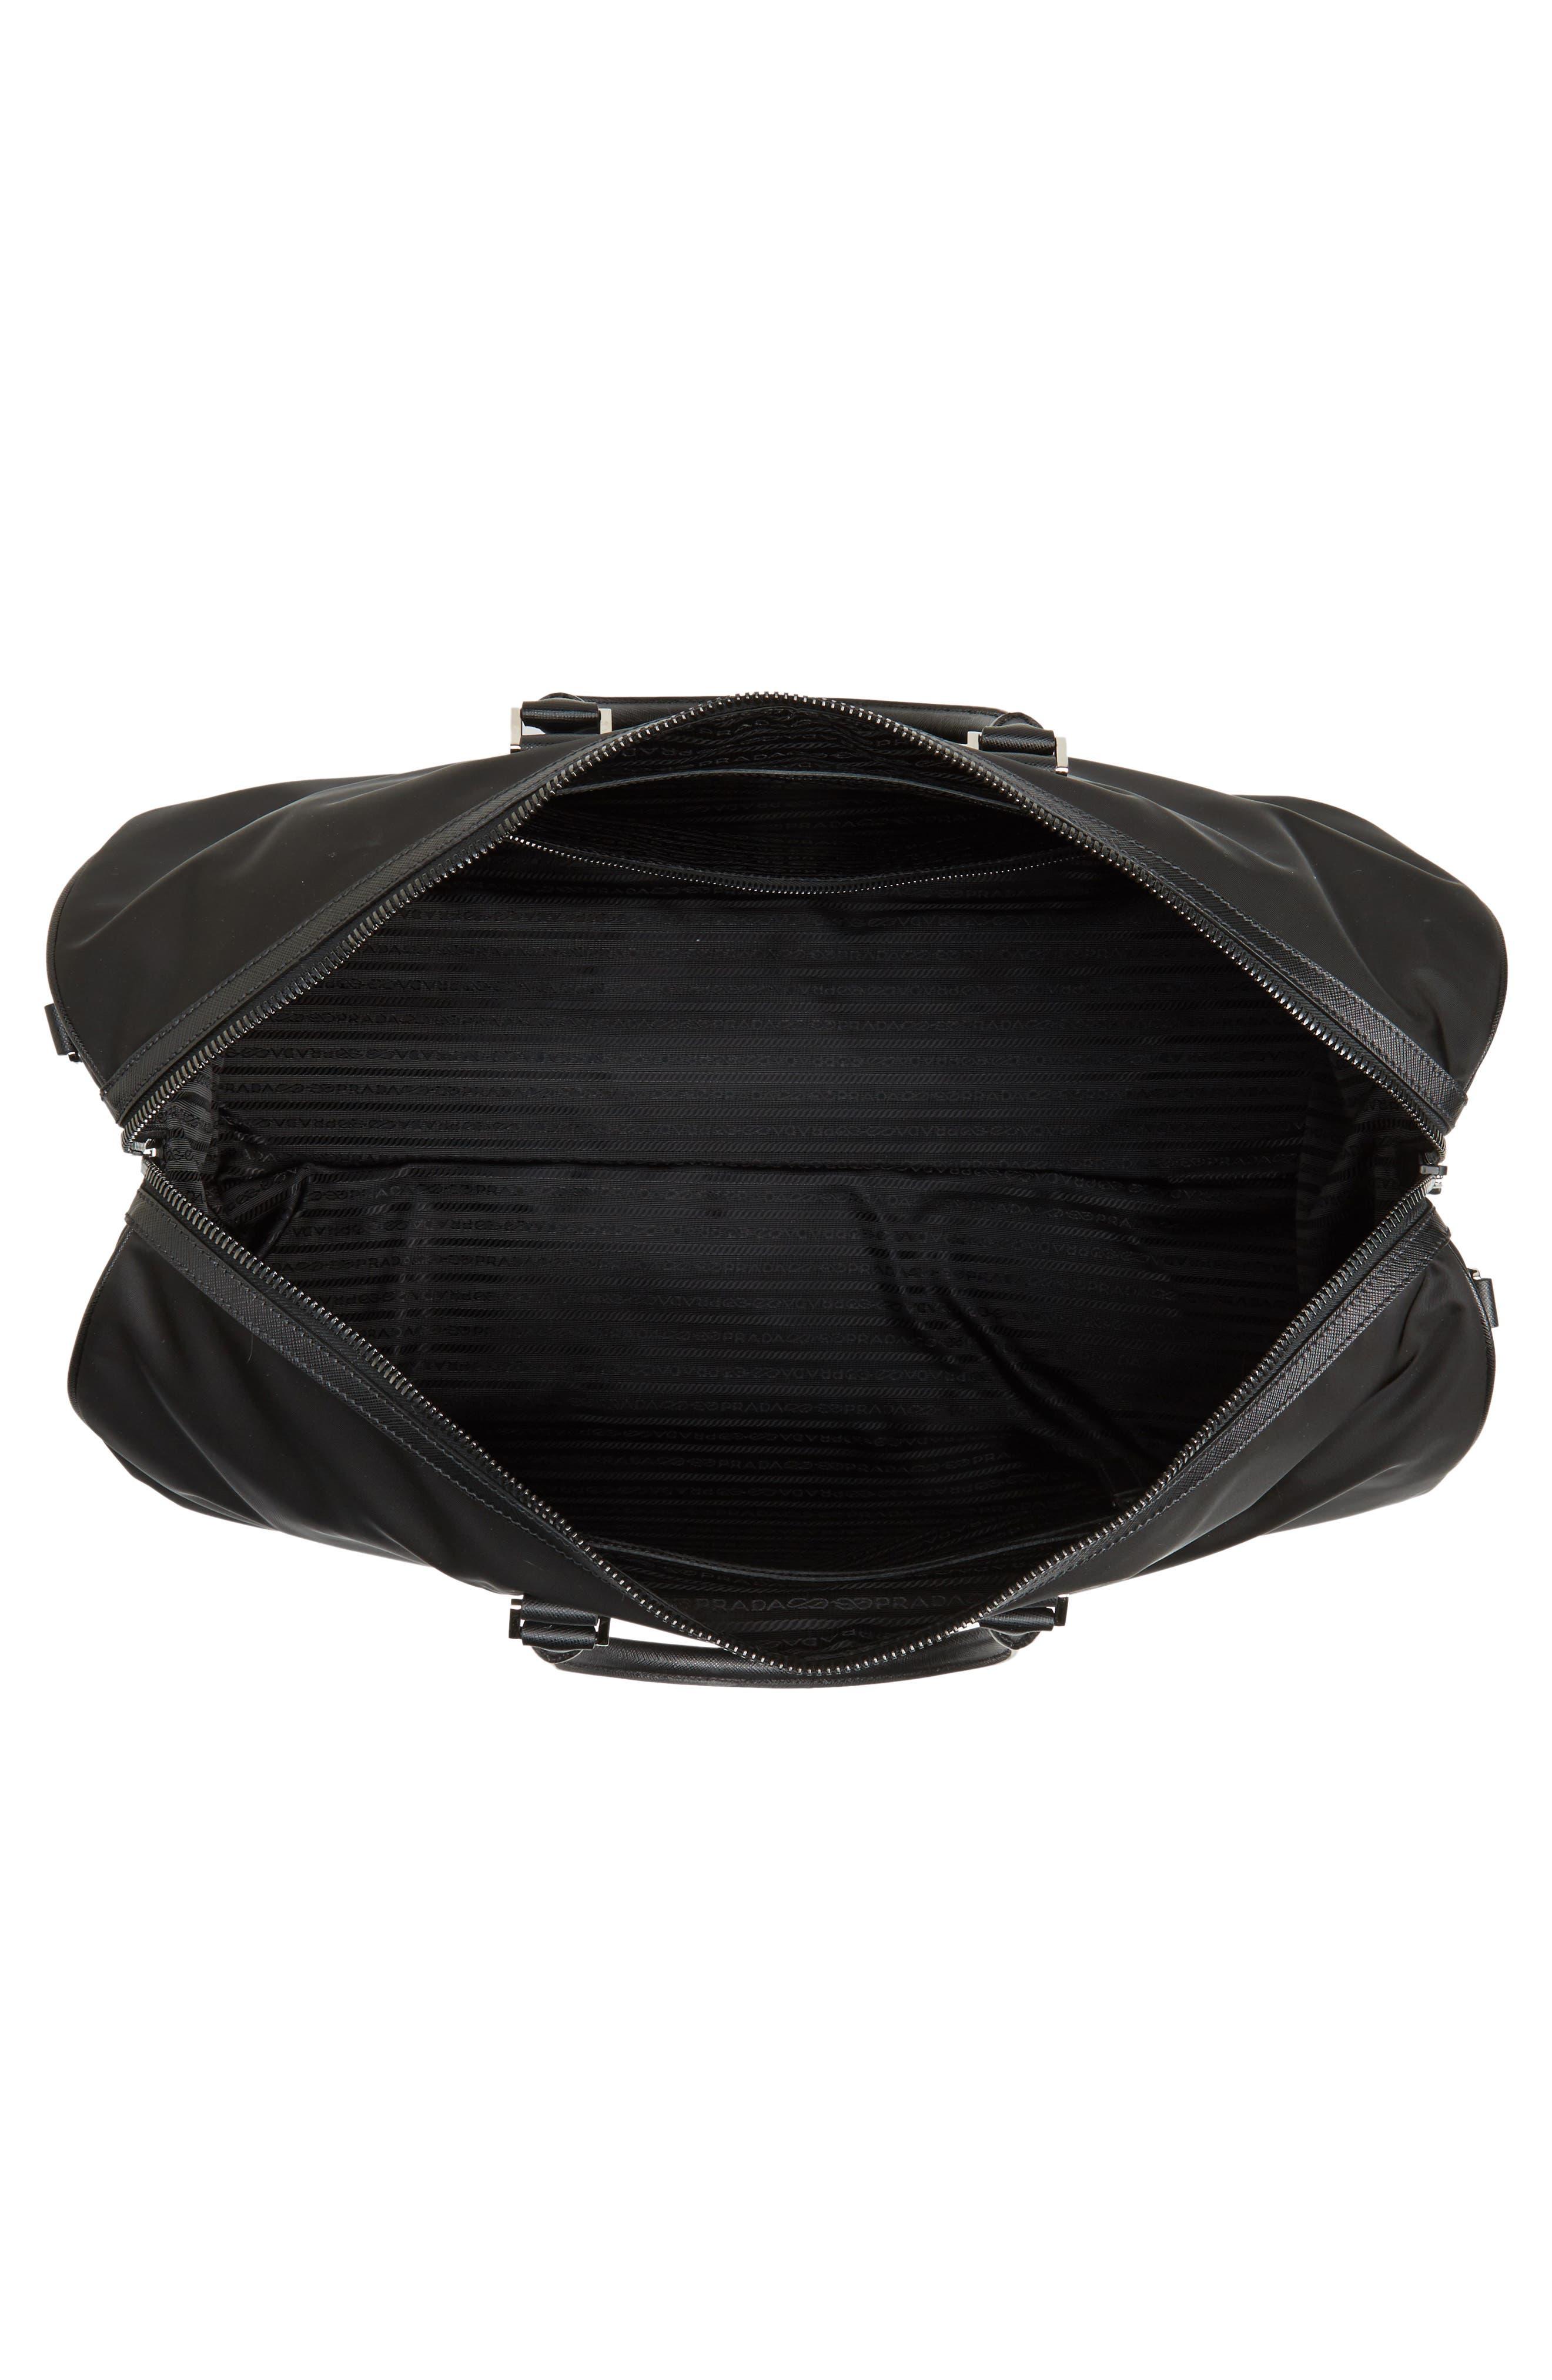 Nylon & Saffiano Leather Bowling Bag,                             Alternate thumbnail 4, color,                             001